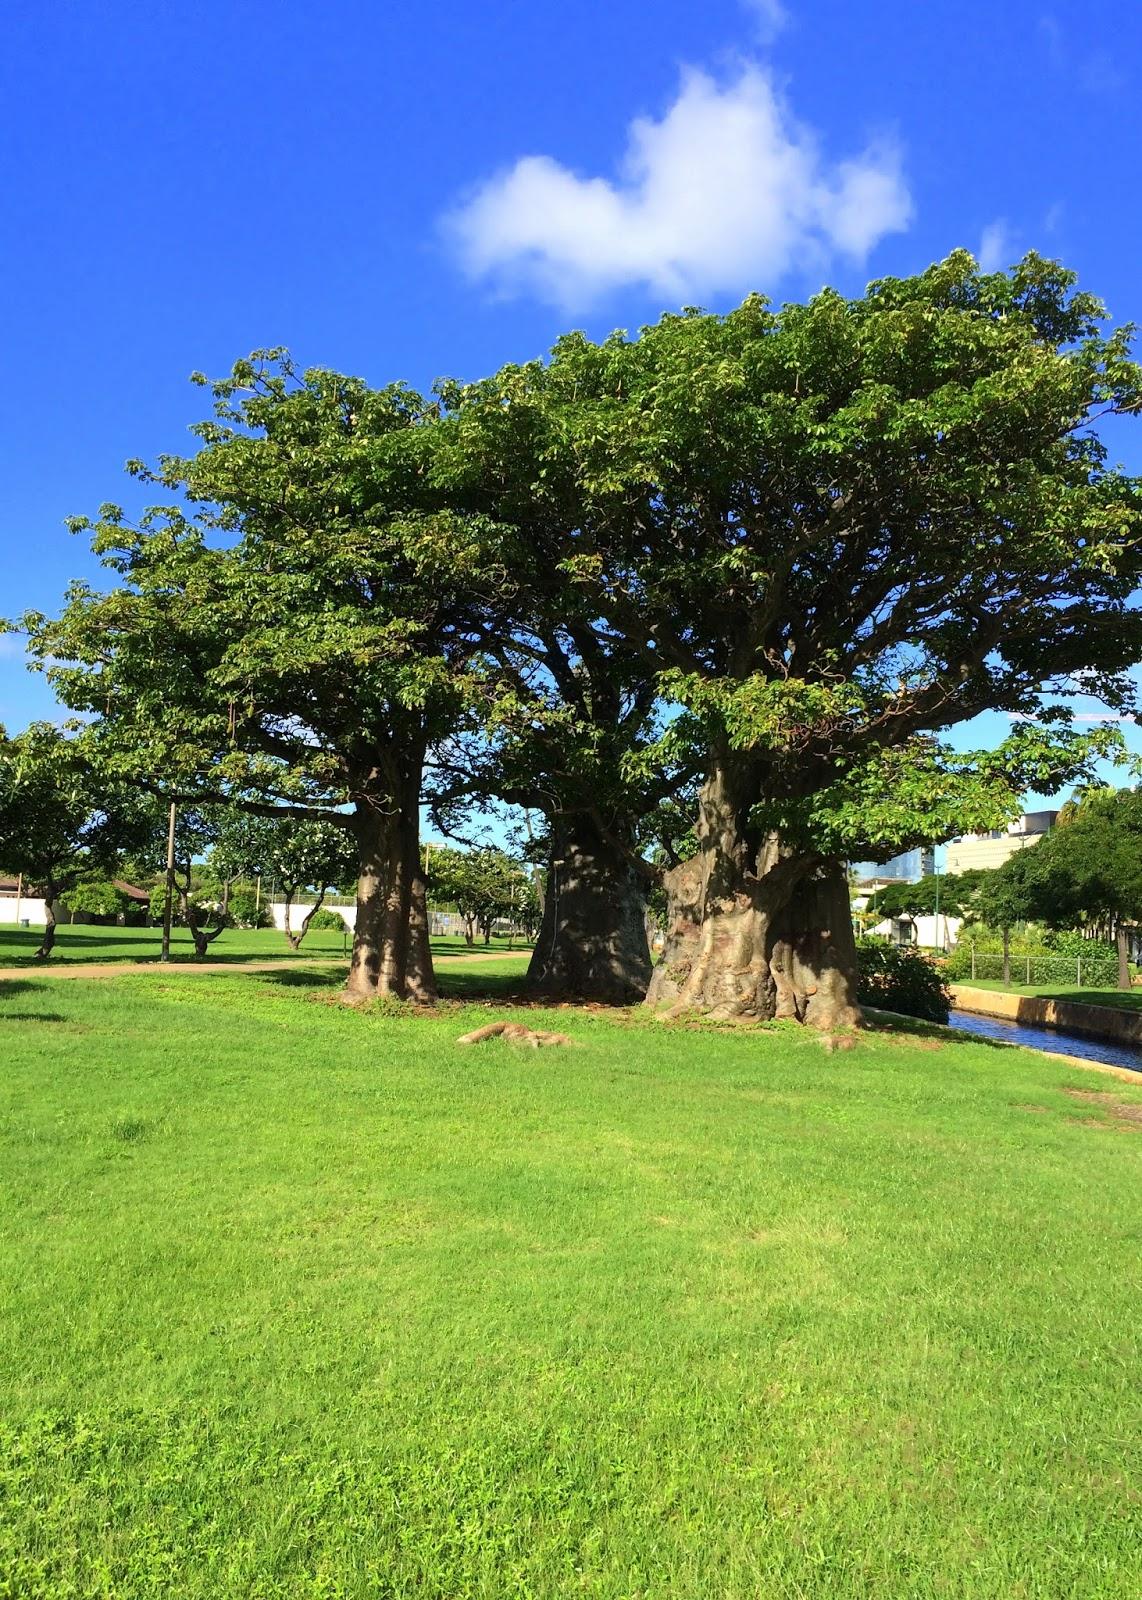 Aloha From Hawaii The Baobab Tree